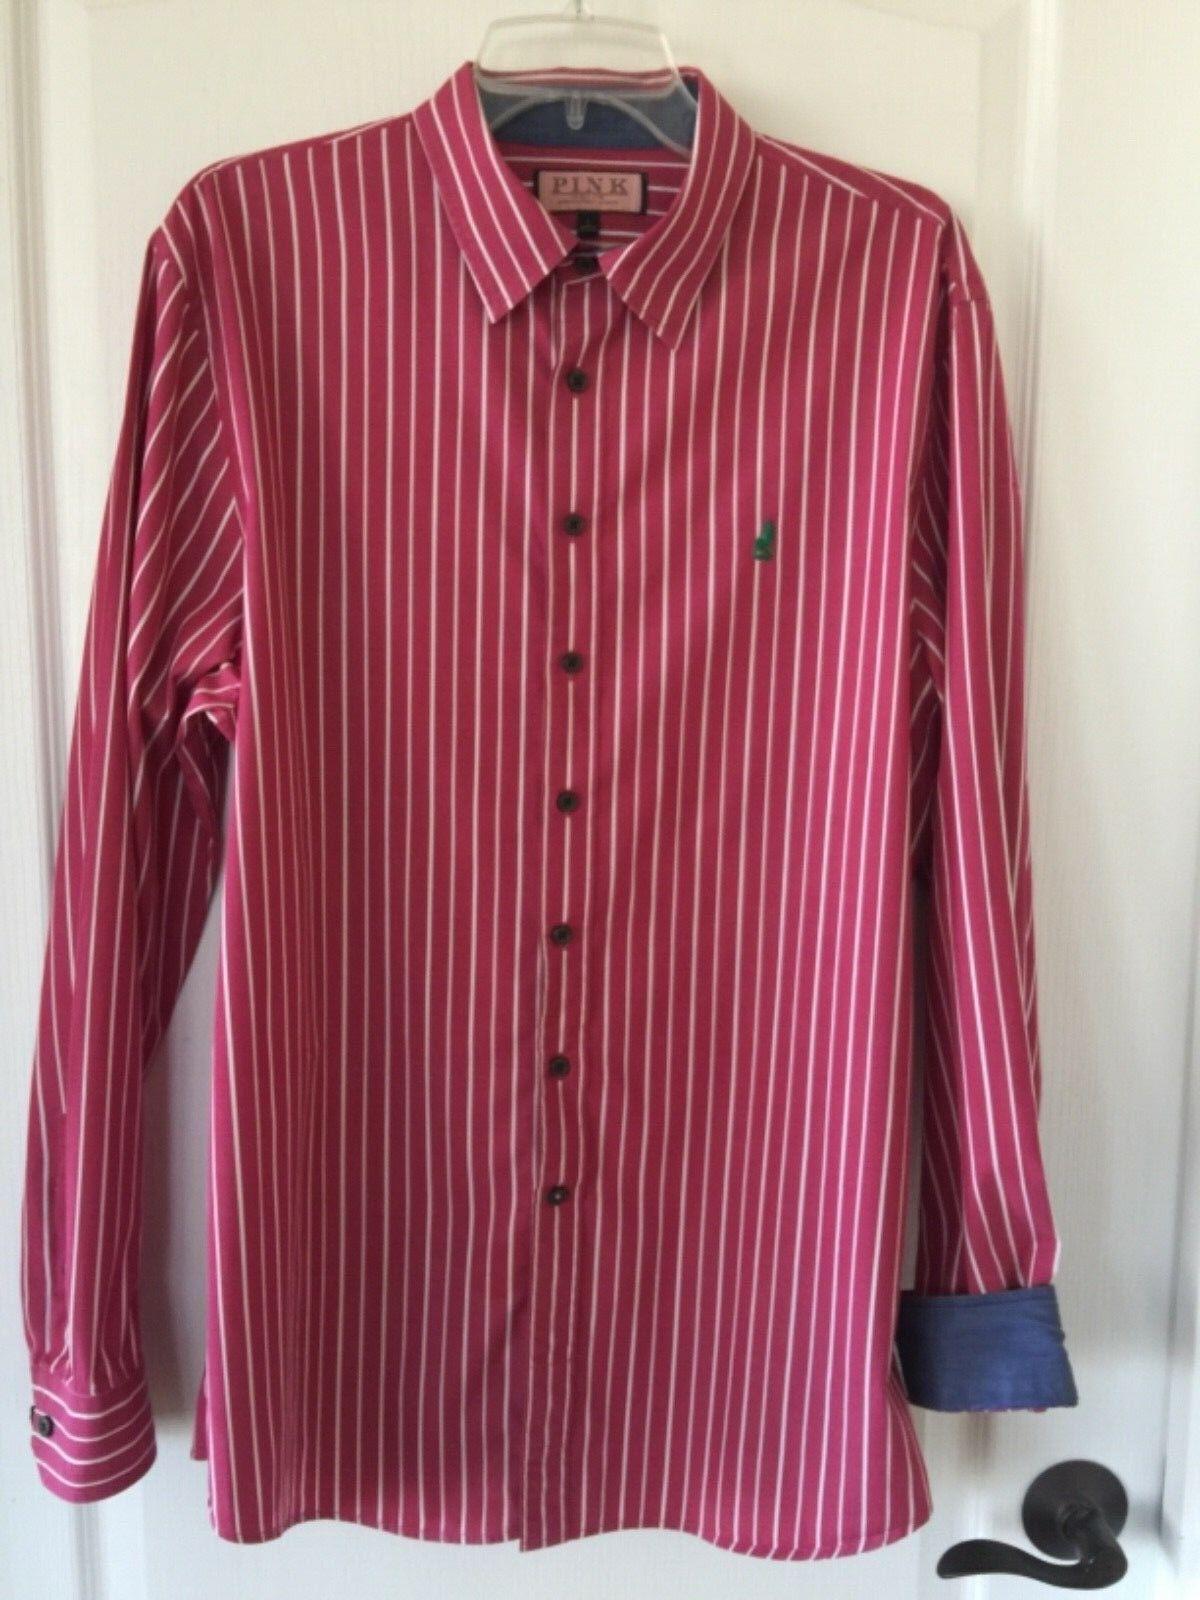 8c8290501 Thomas Men's Casual Sleeve Button Down Shirt Size L Pink Long ...